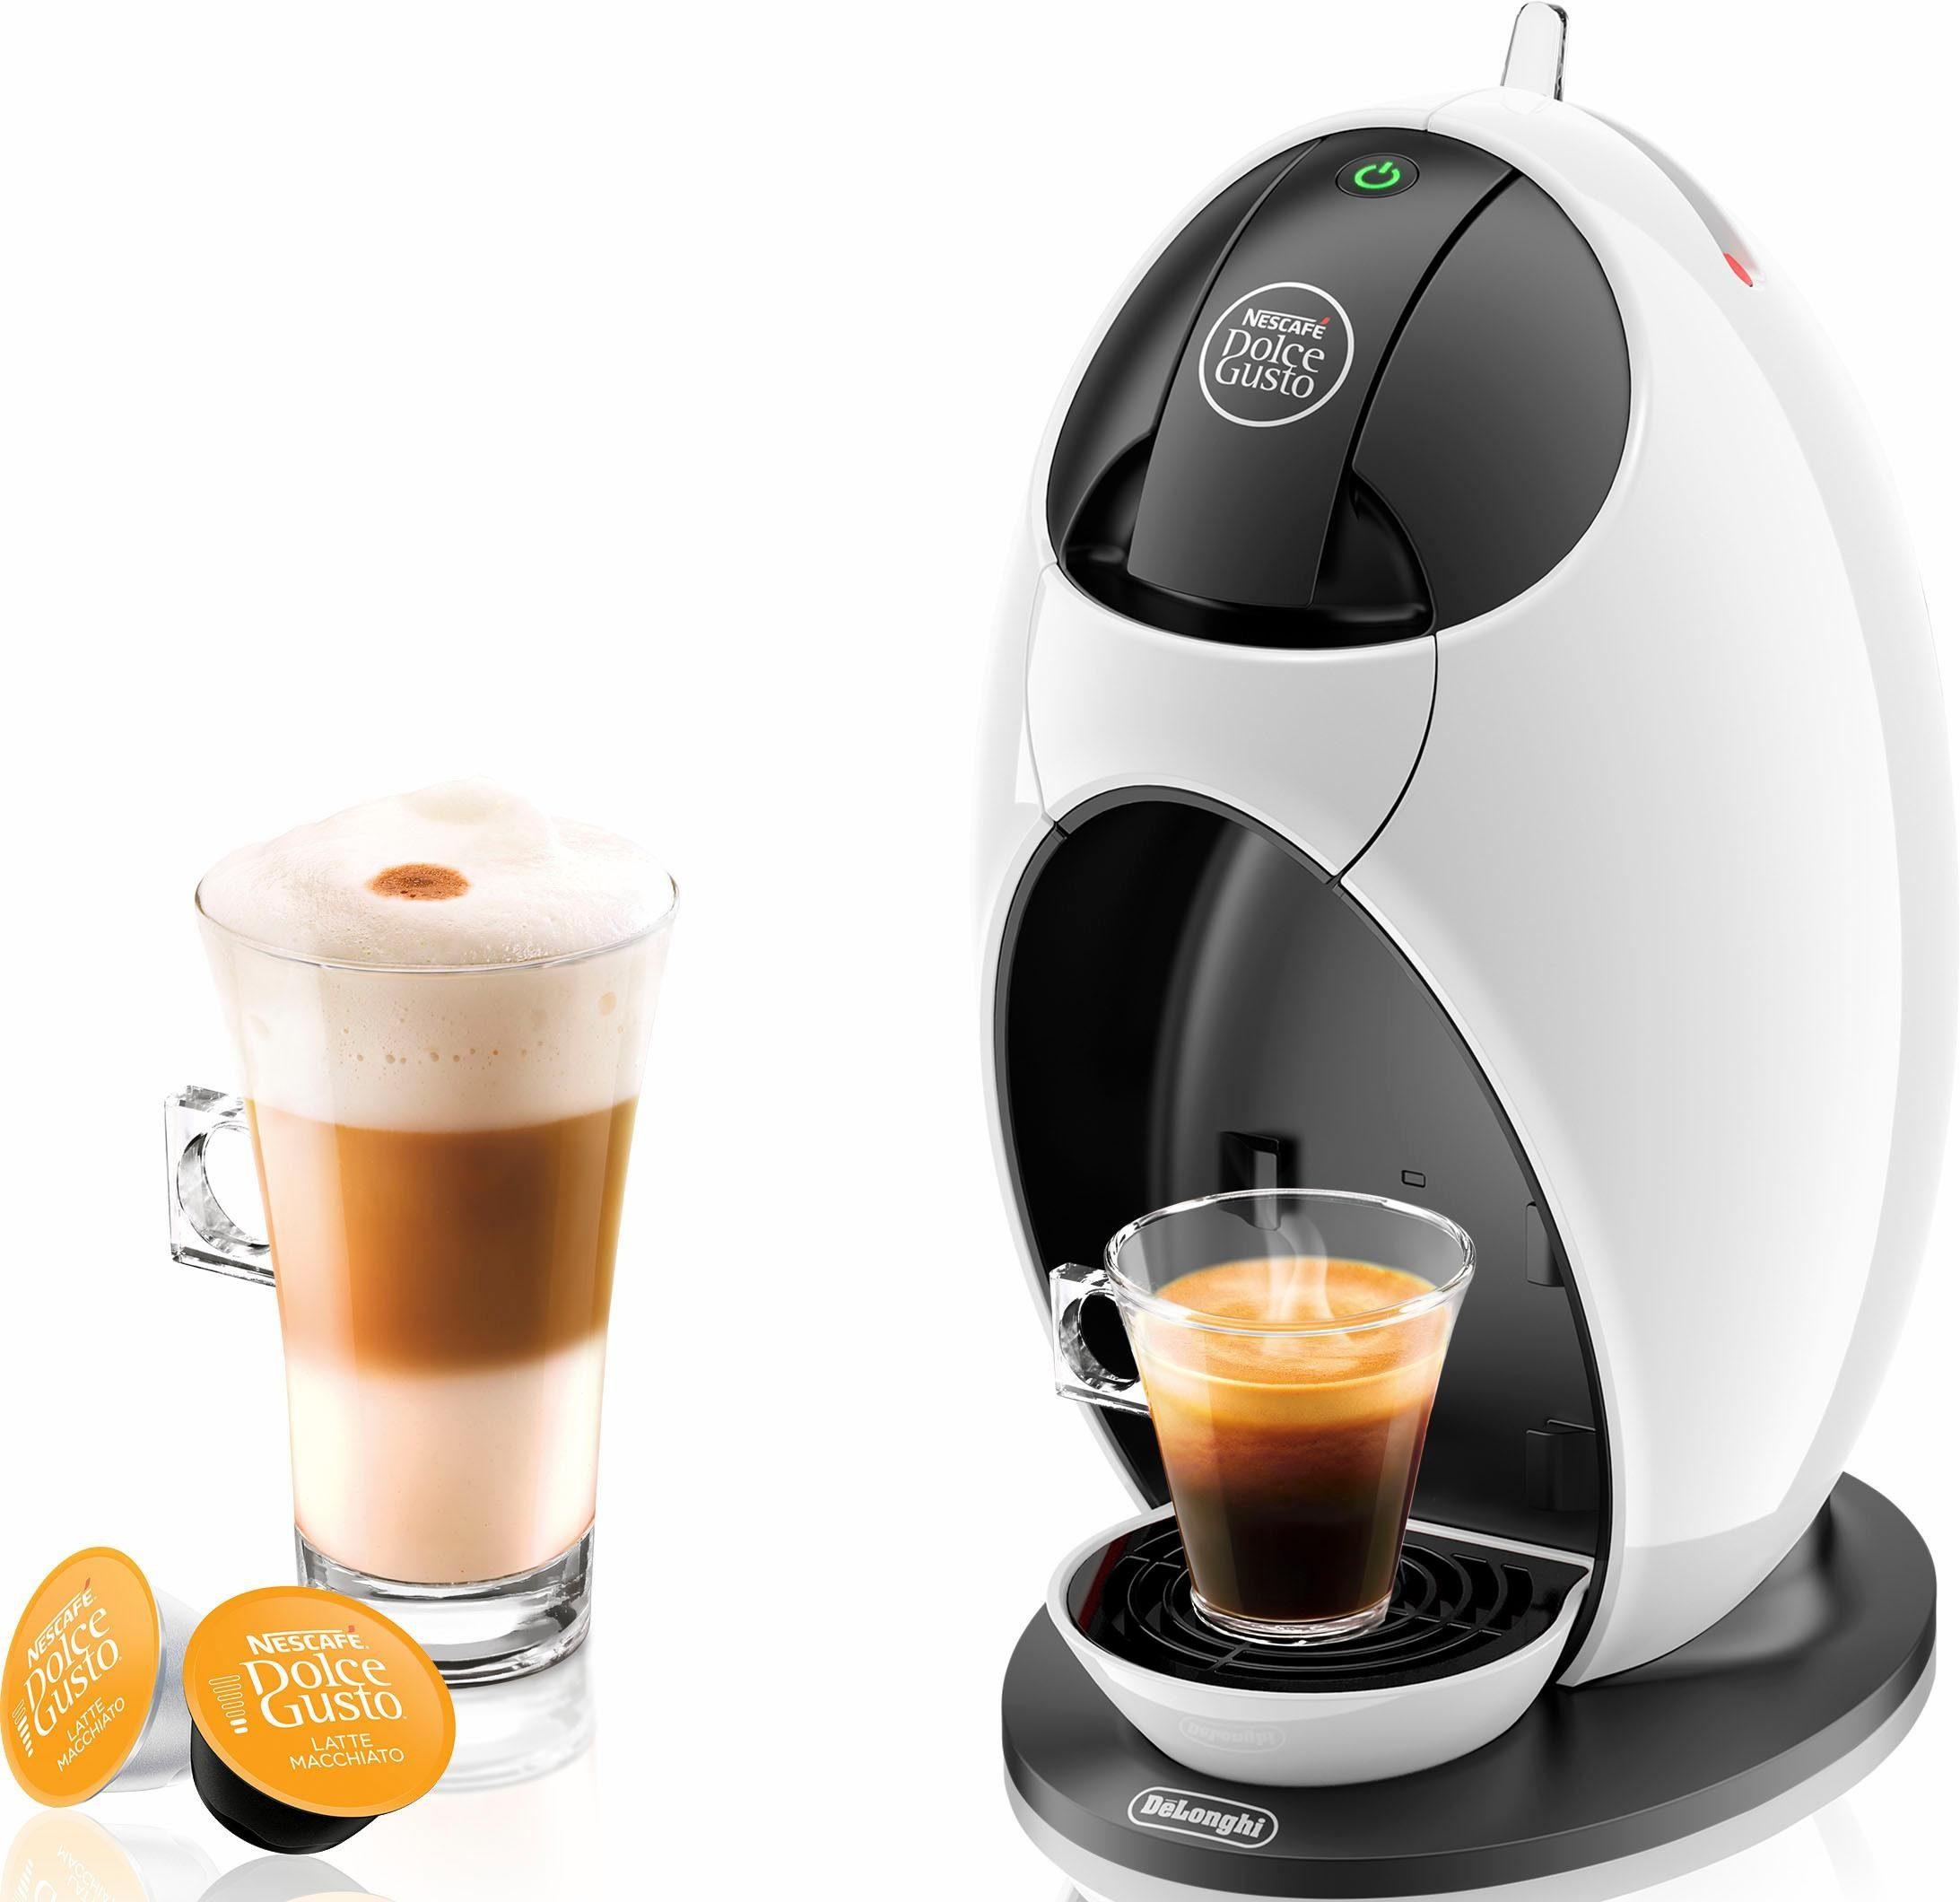 Nescafé Dolce Gusto Kapselmaschine NESCAFÉ® Dolce Gusto® Jovia EDG 250.W, inkl. 40€ Online Gutschein